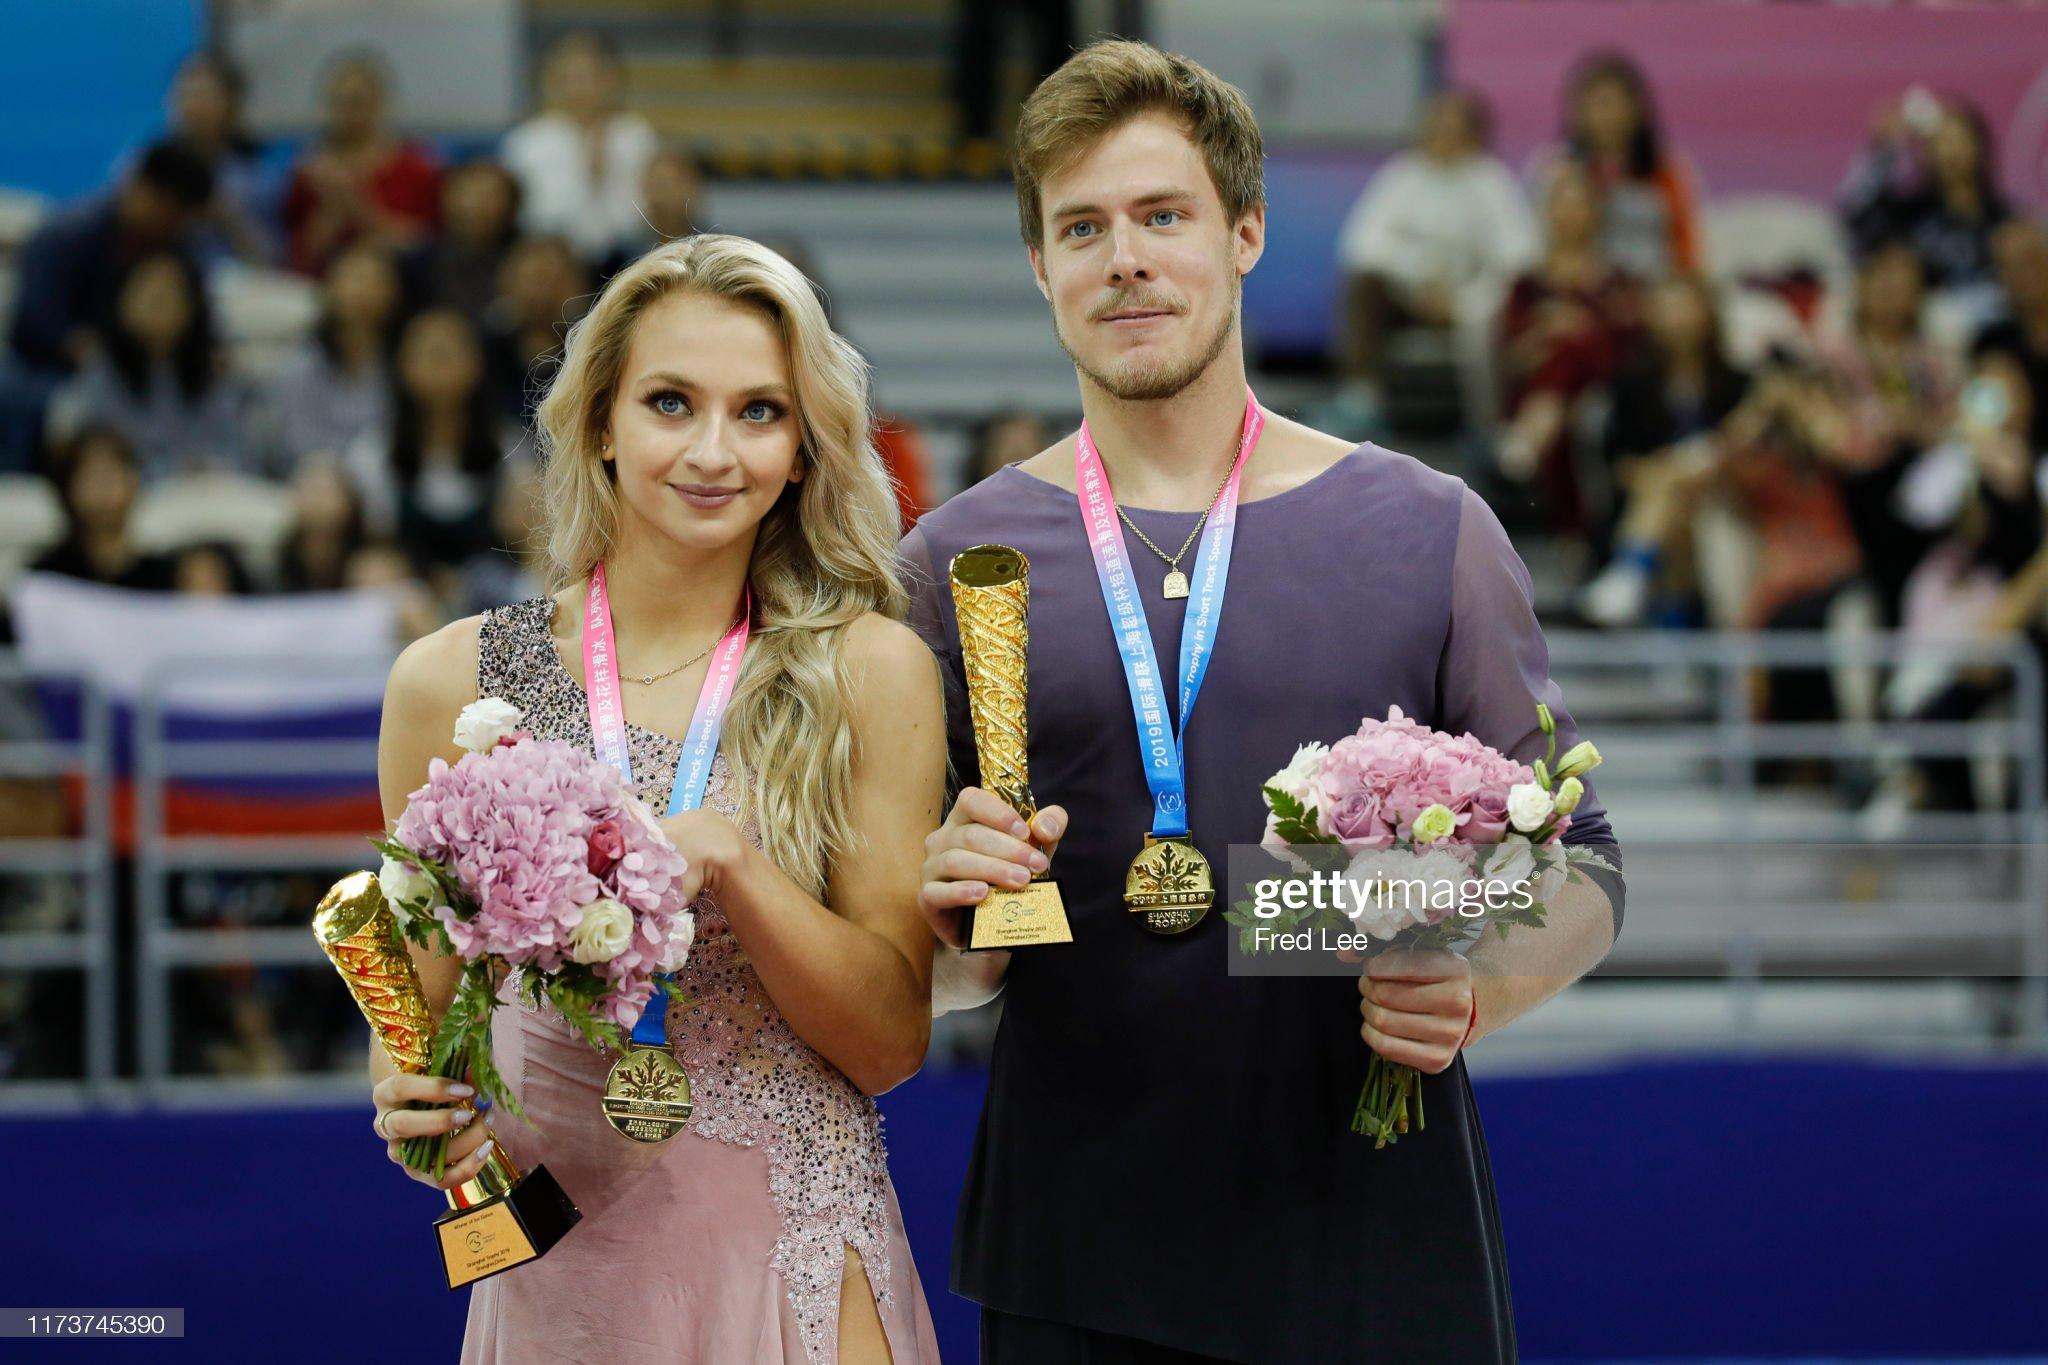 Shanghai Trophy (Invitational). 3-5 октября 2019. Шанхай (Китай) - Страница 7 Victoria-sinitsina-and-nikita-katsalapov-of-russia-pose-in-the-medal-picture-id1173745390?s=2048x2048